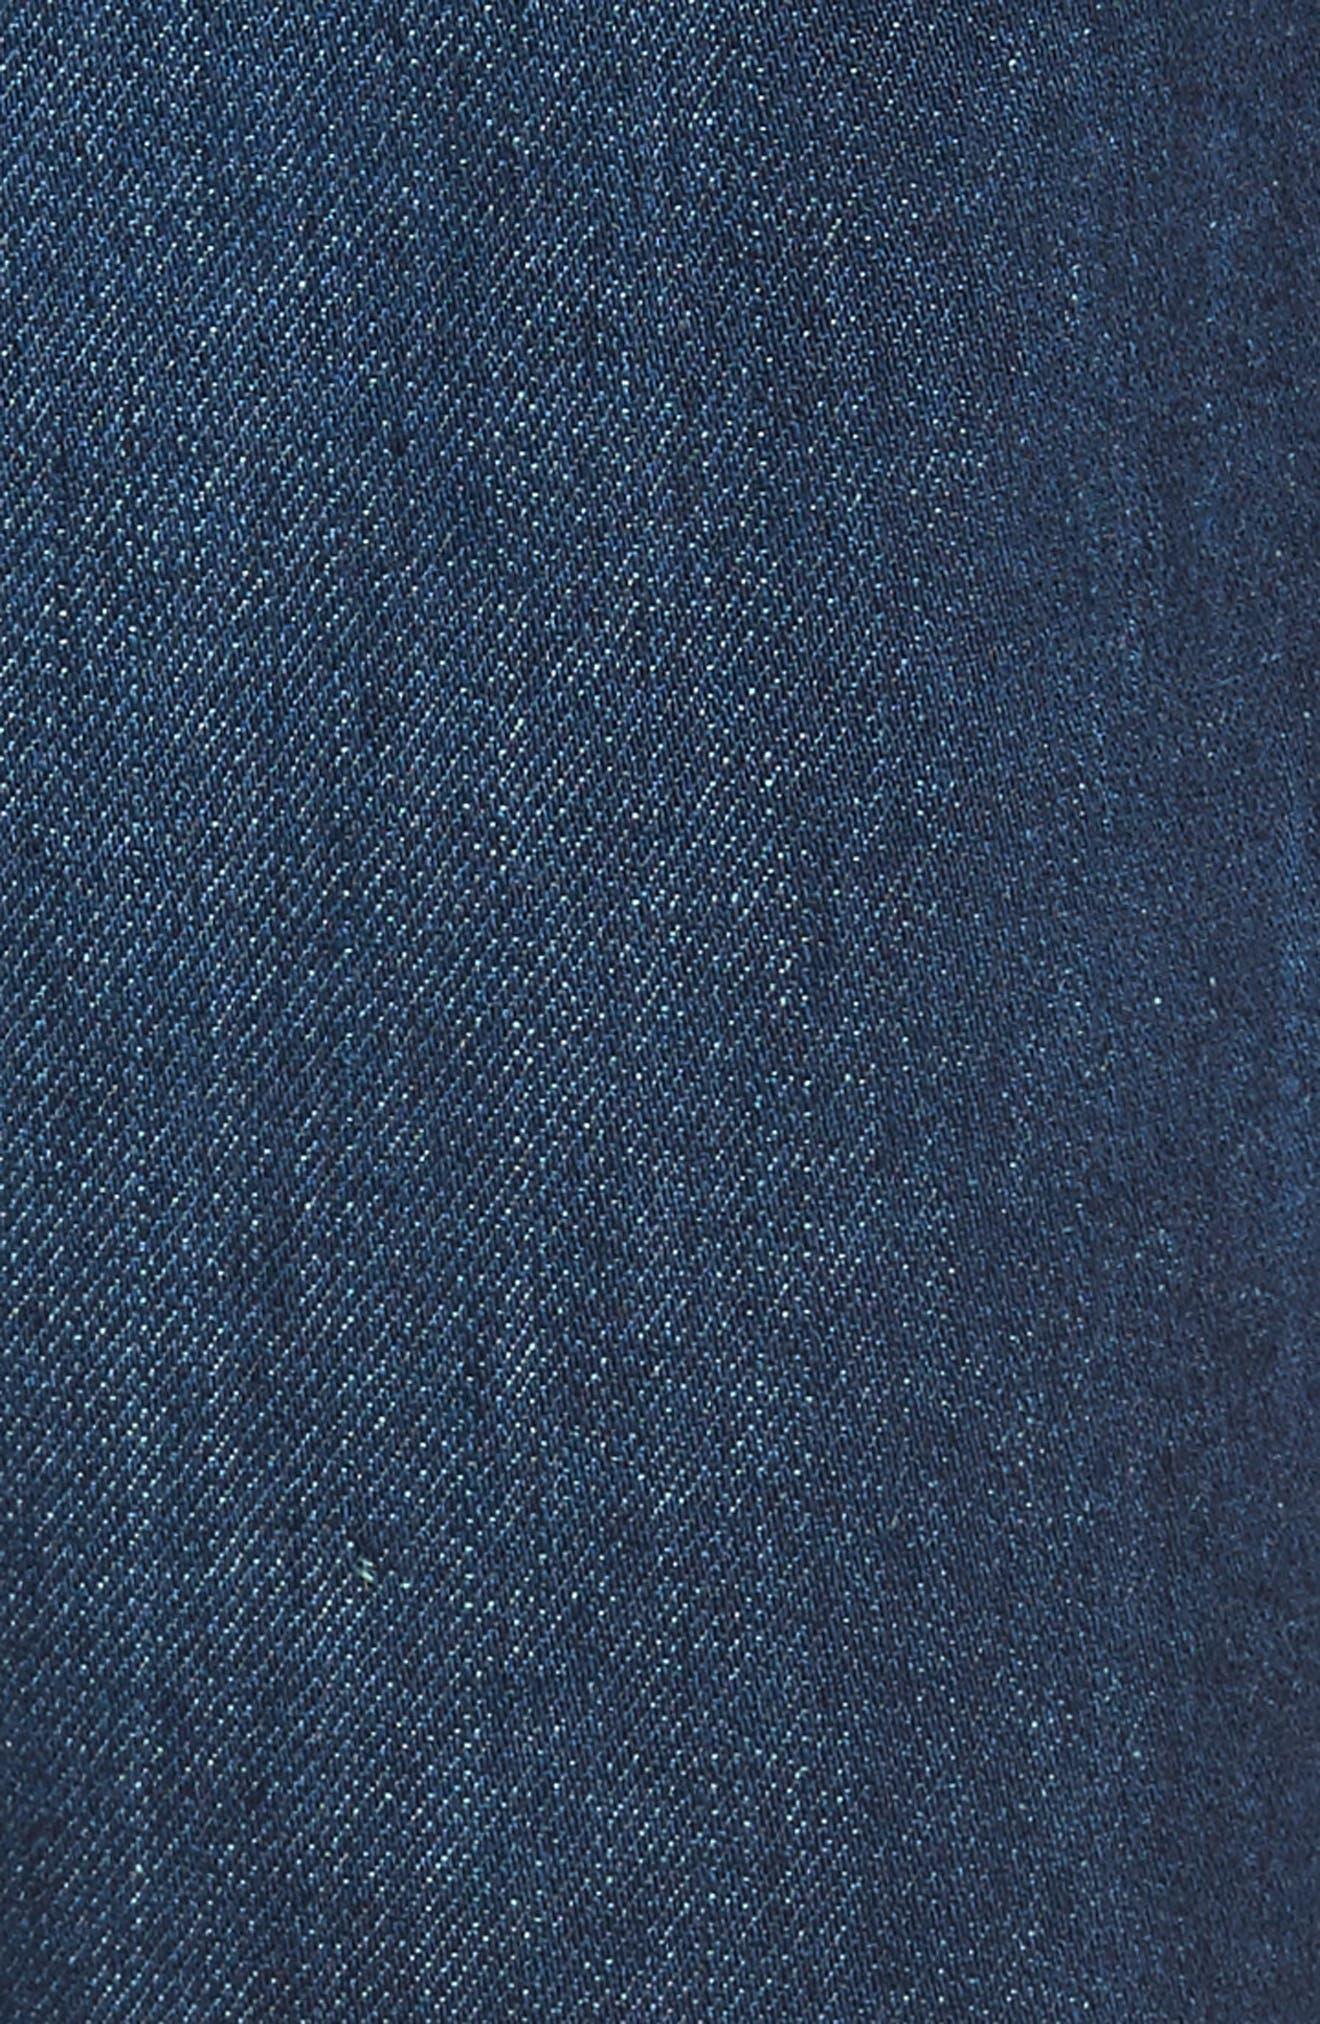 Graduate Slim Straight Fit Jeans,                             Alternate thumbnail 5, color,                             5 Years Porter